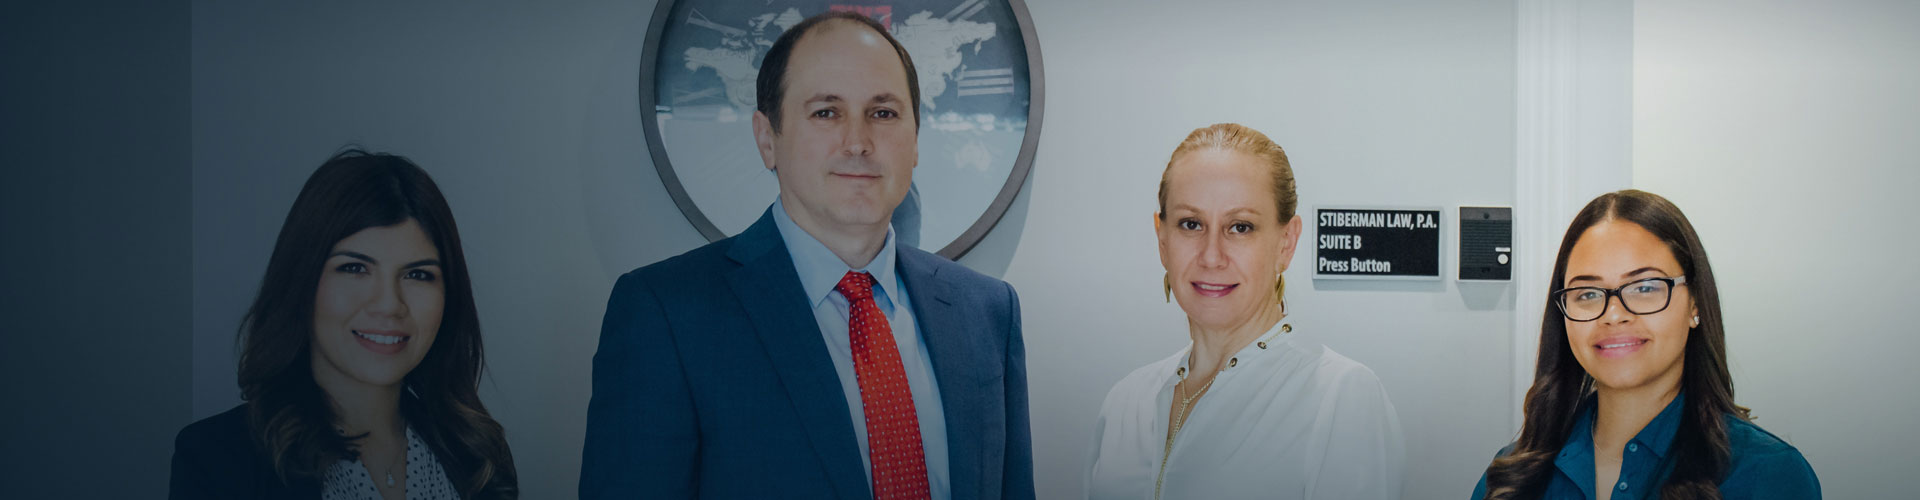 Boca Ratón Bankruptcy Attorneys - Stiberman Law Firm